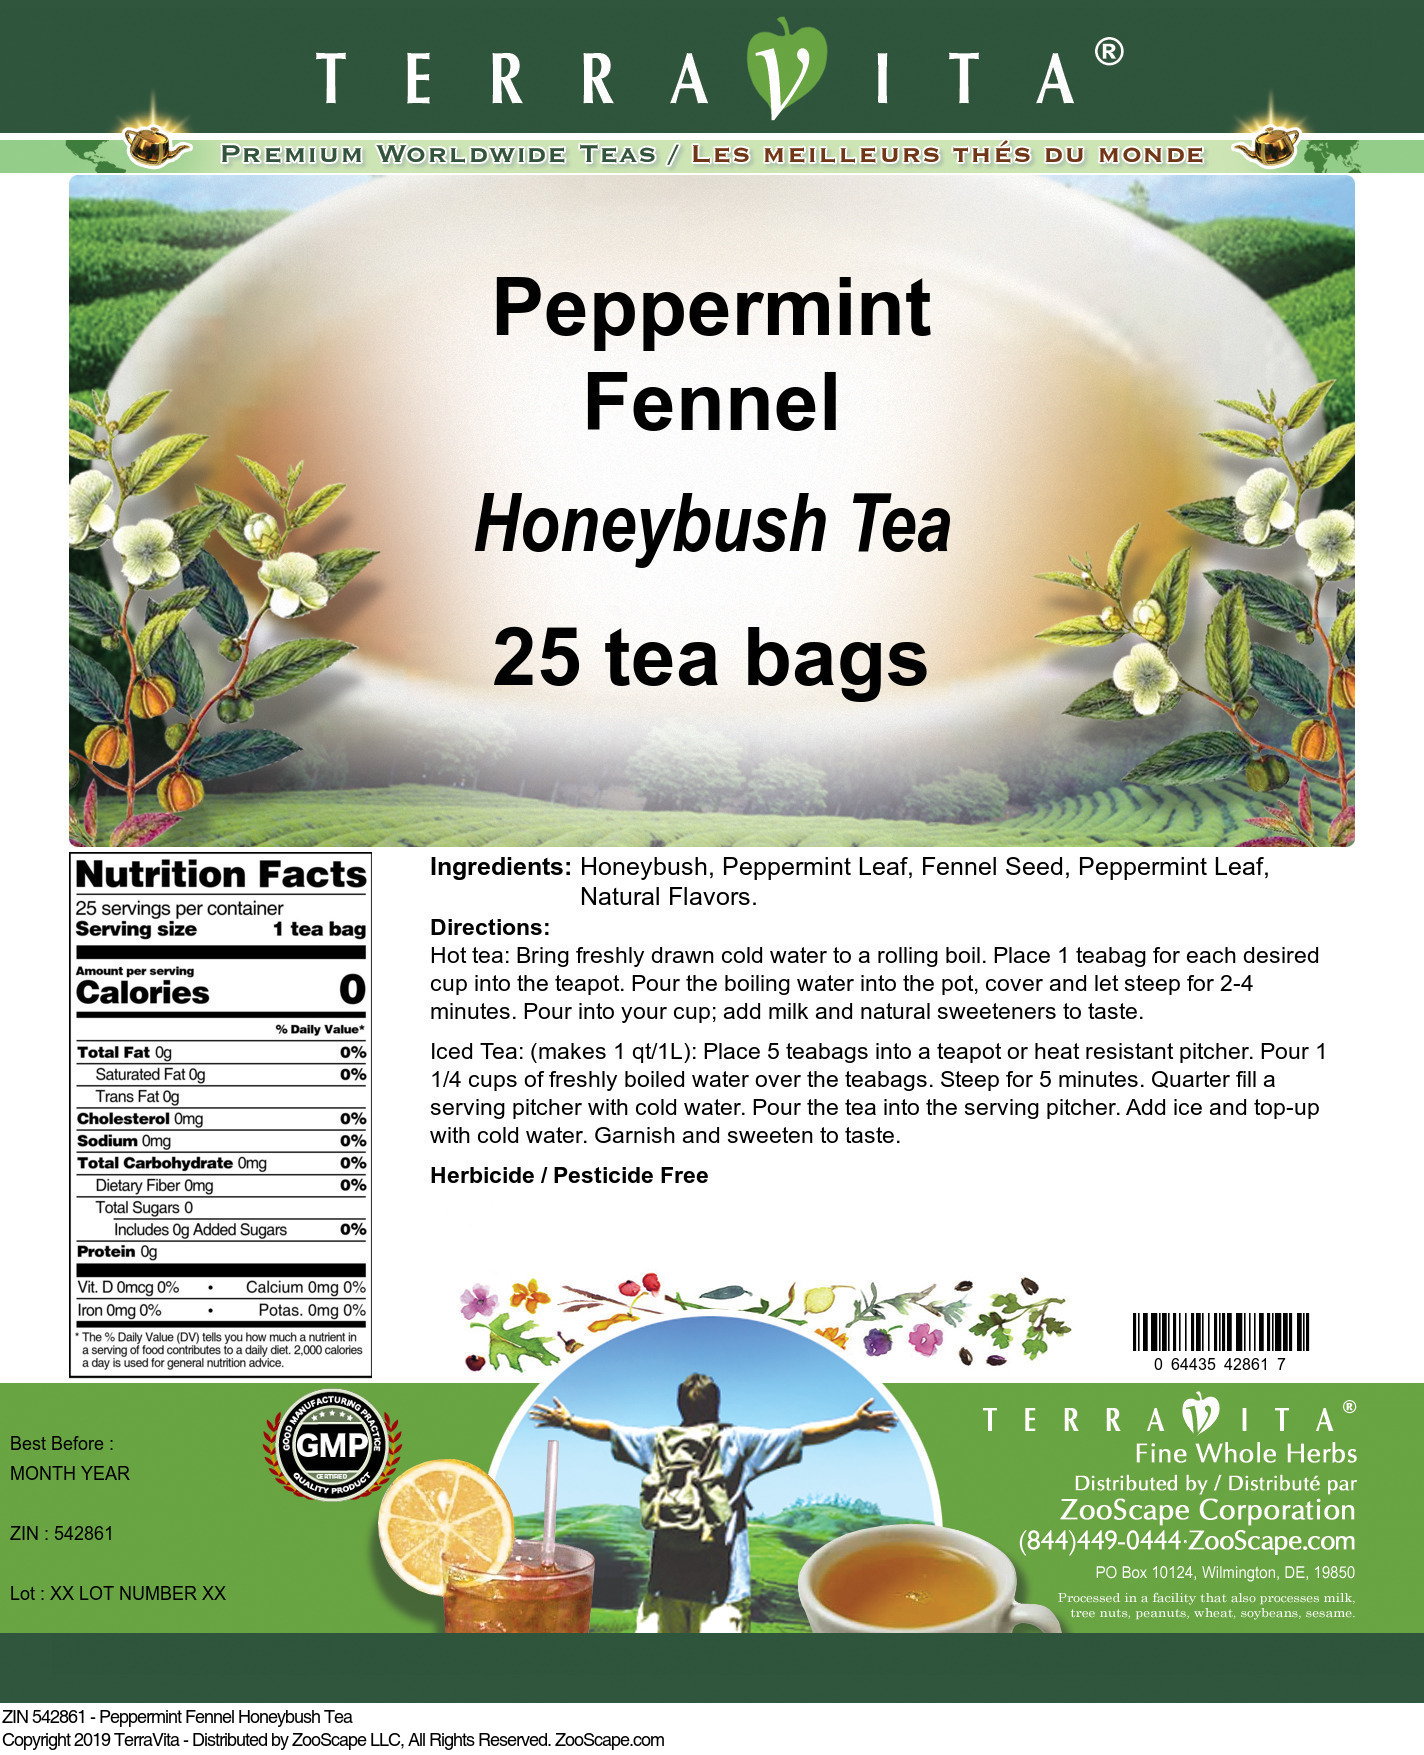 Peppermint Fennel Honeybush Tea